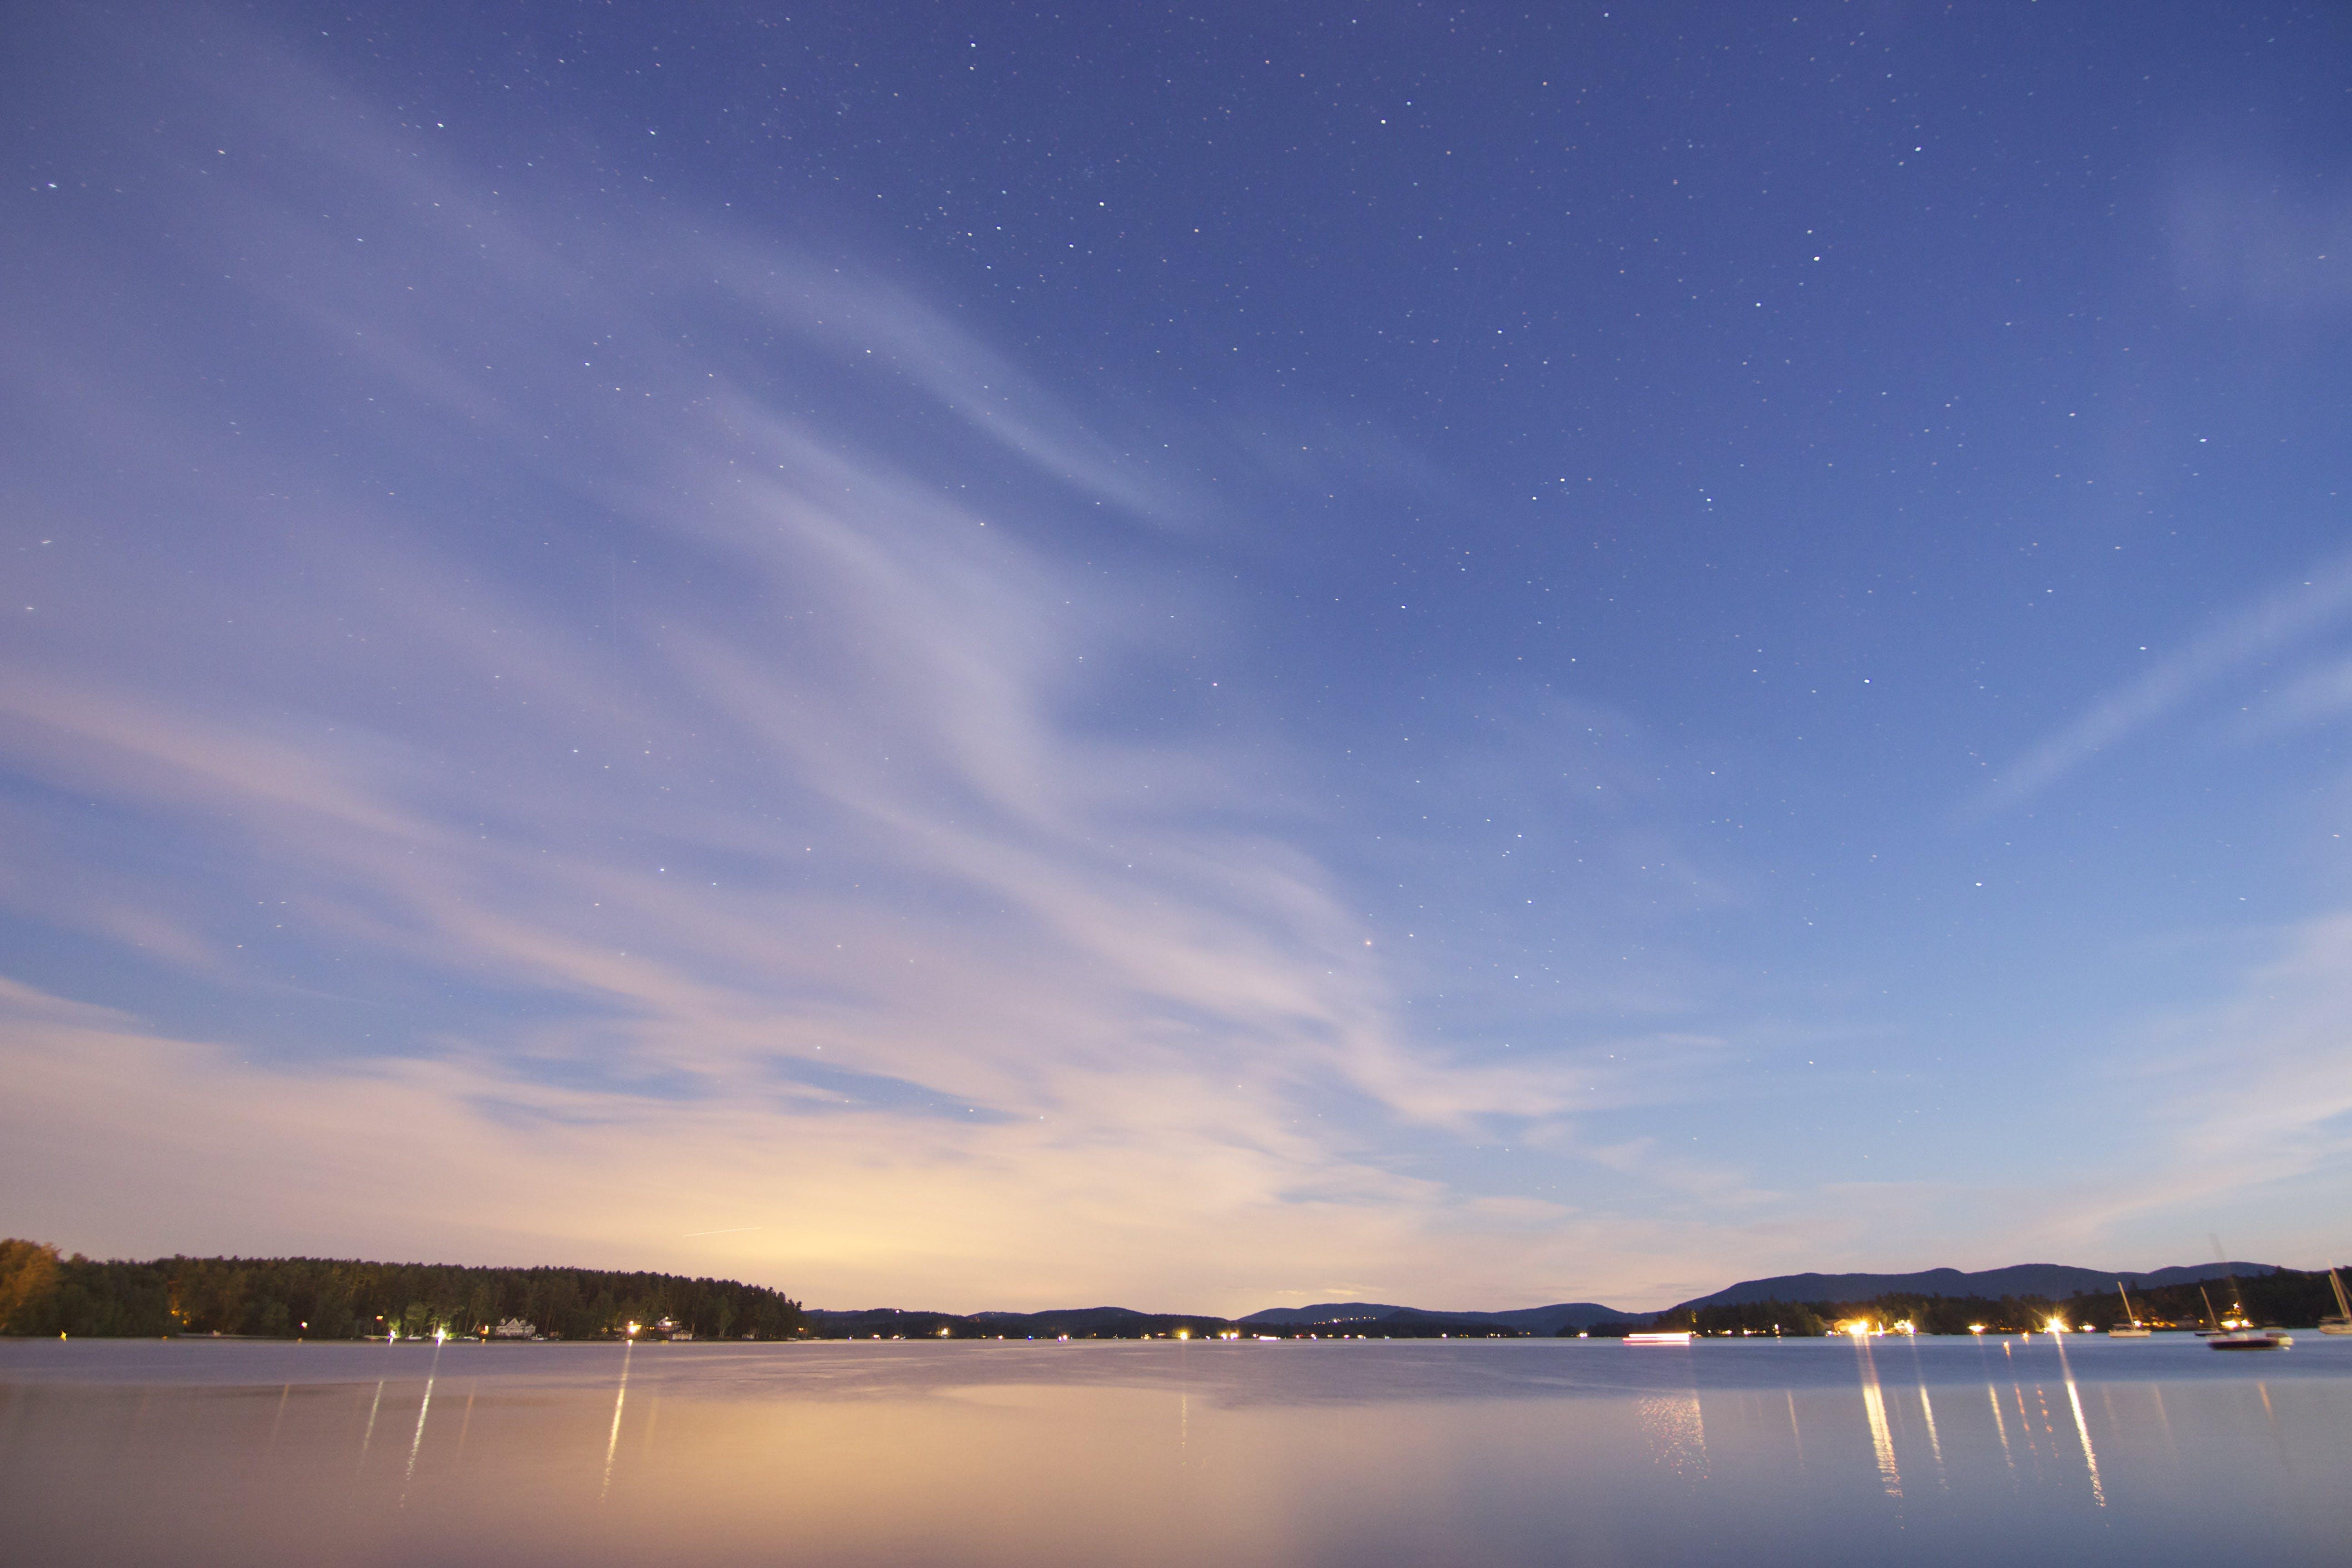 cel, estrelles, skyscape